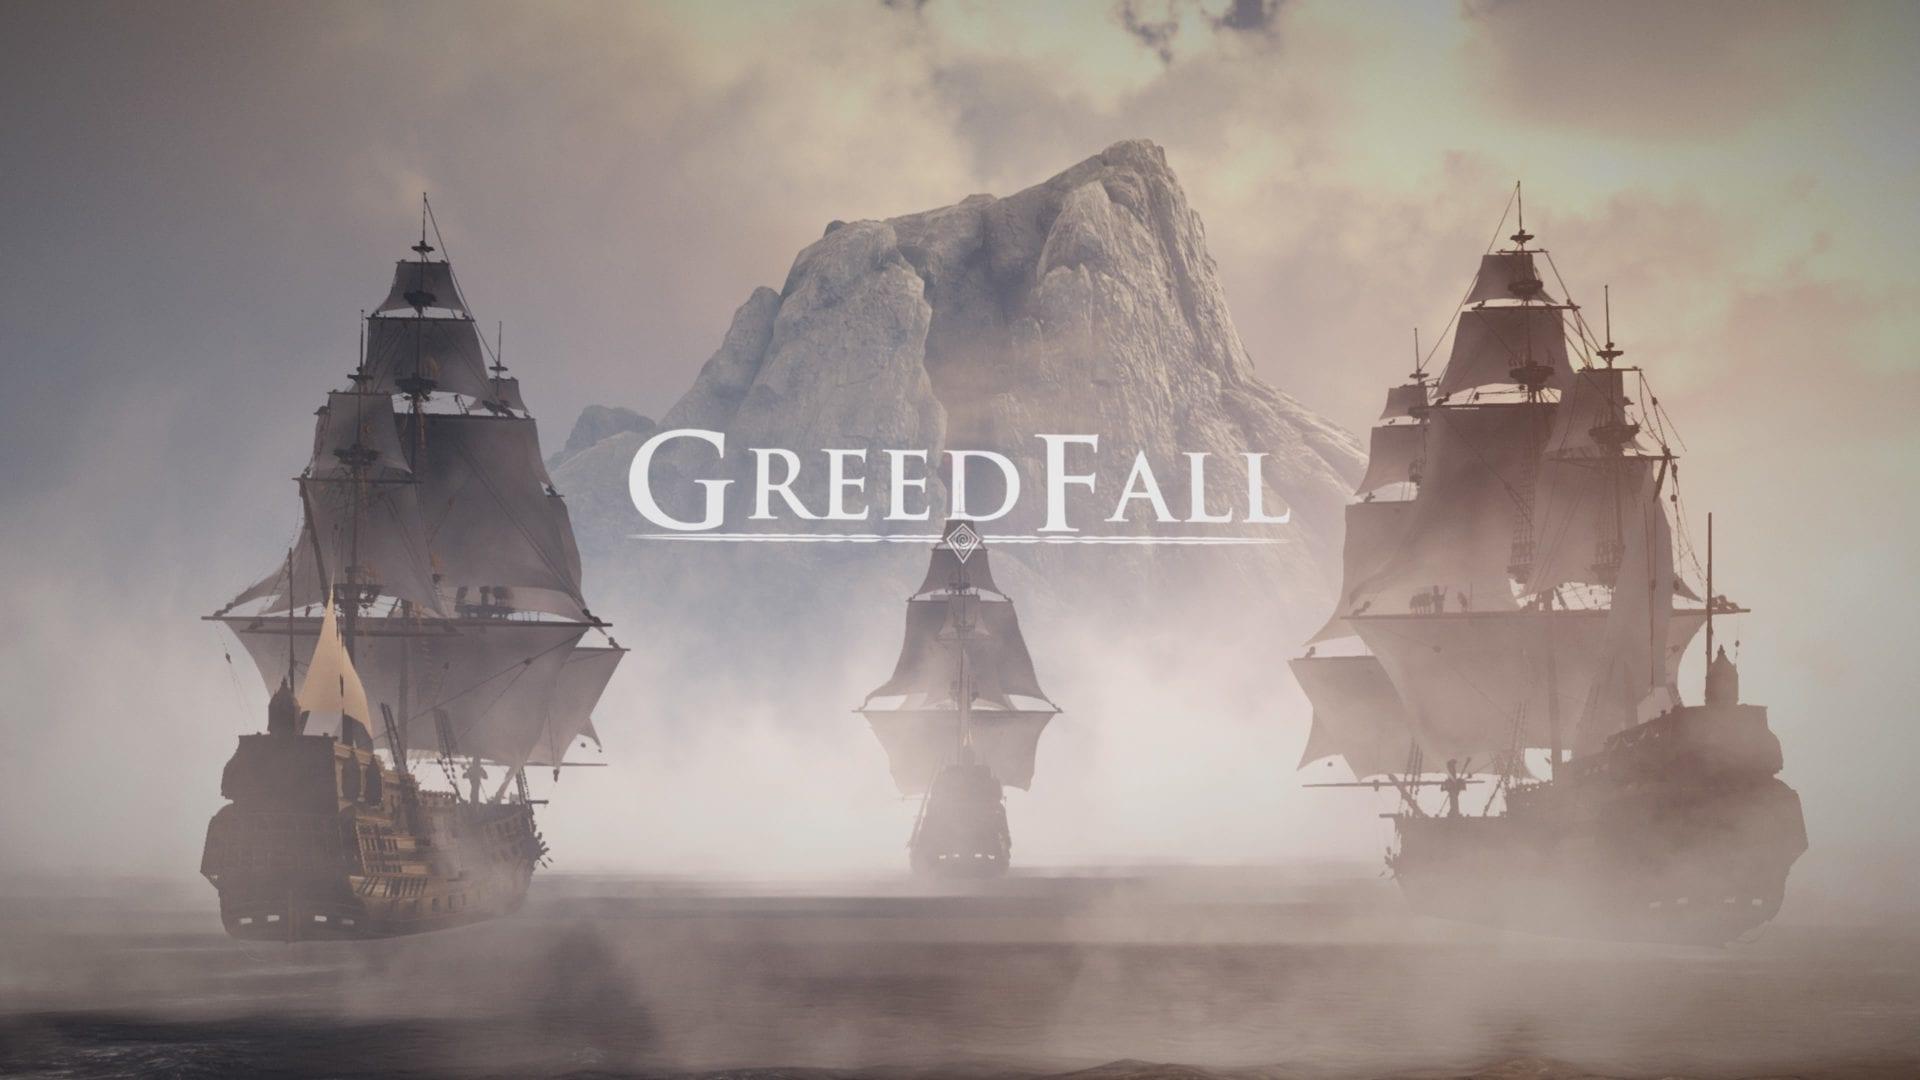 greedfall, beat creature